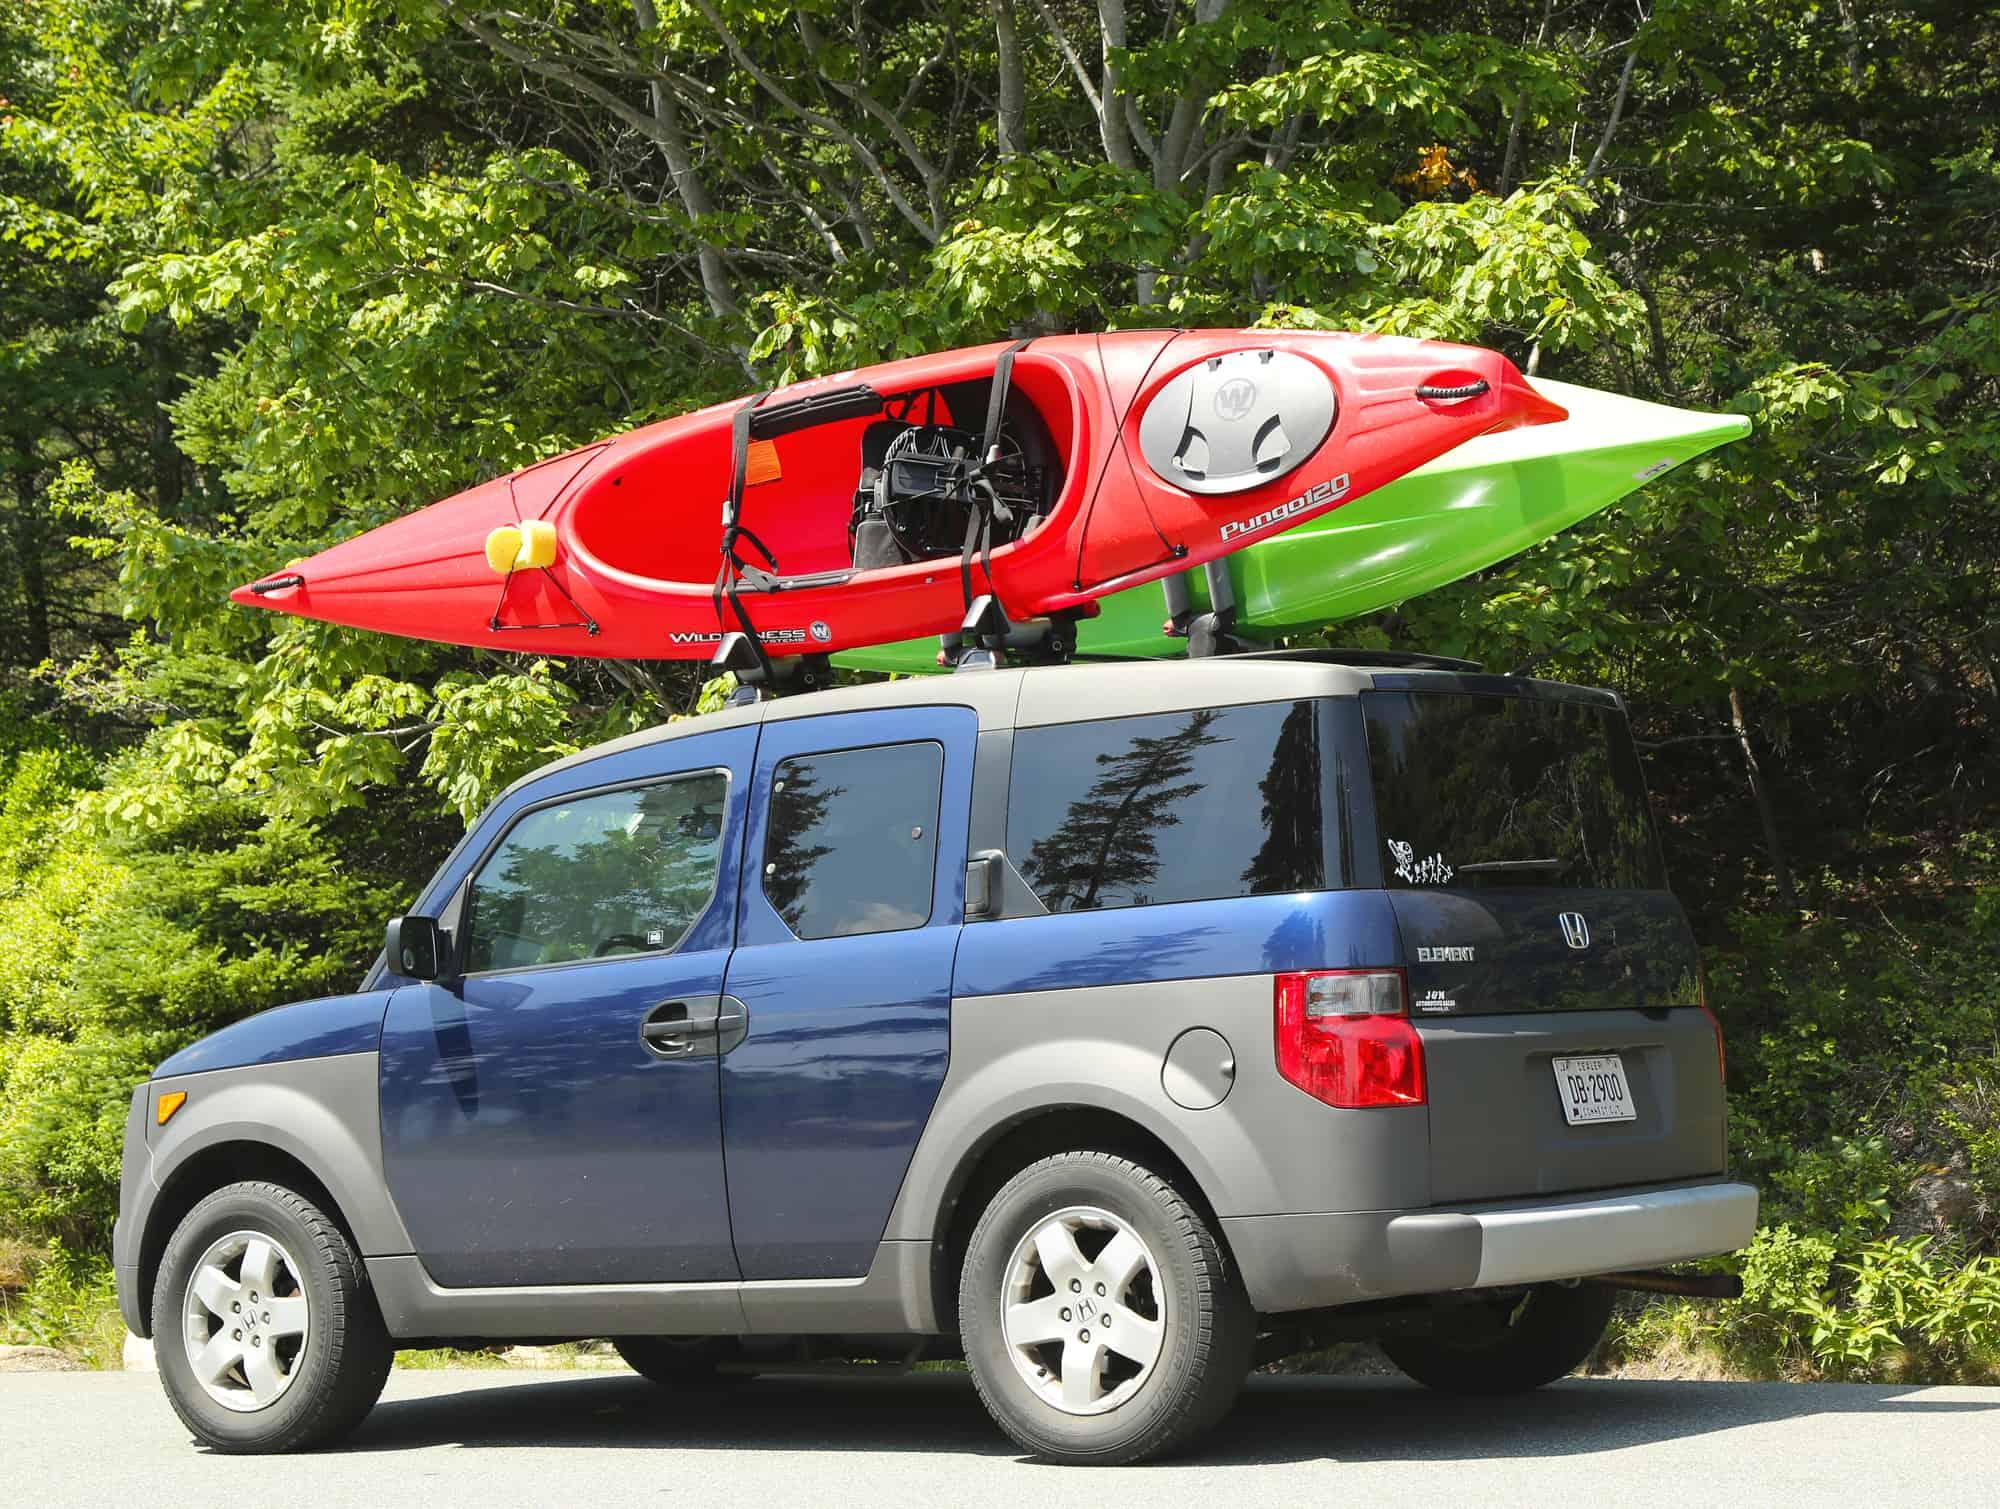 Best Kayak Racks for Cars, SUVs, and Trucks - Kayak Help